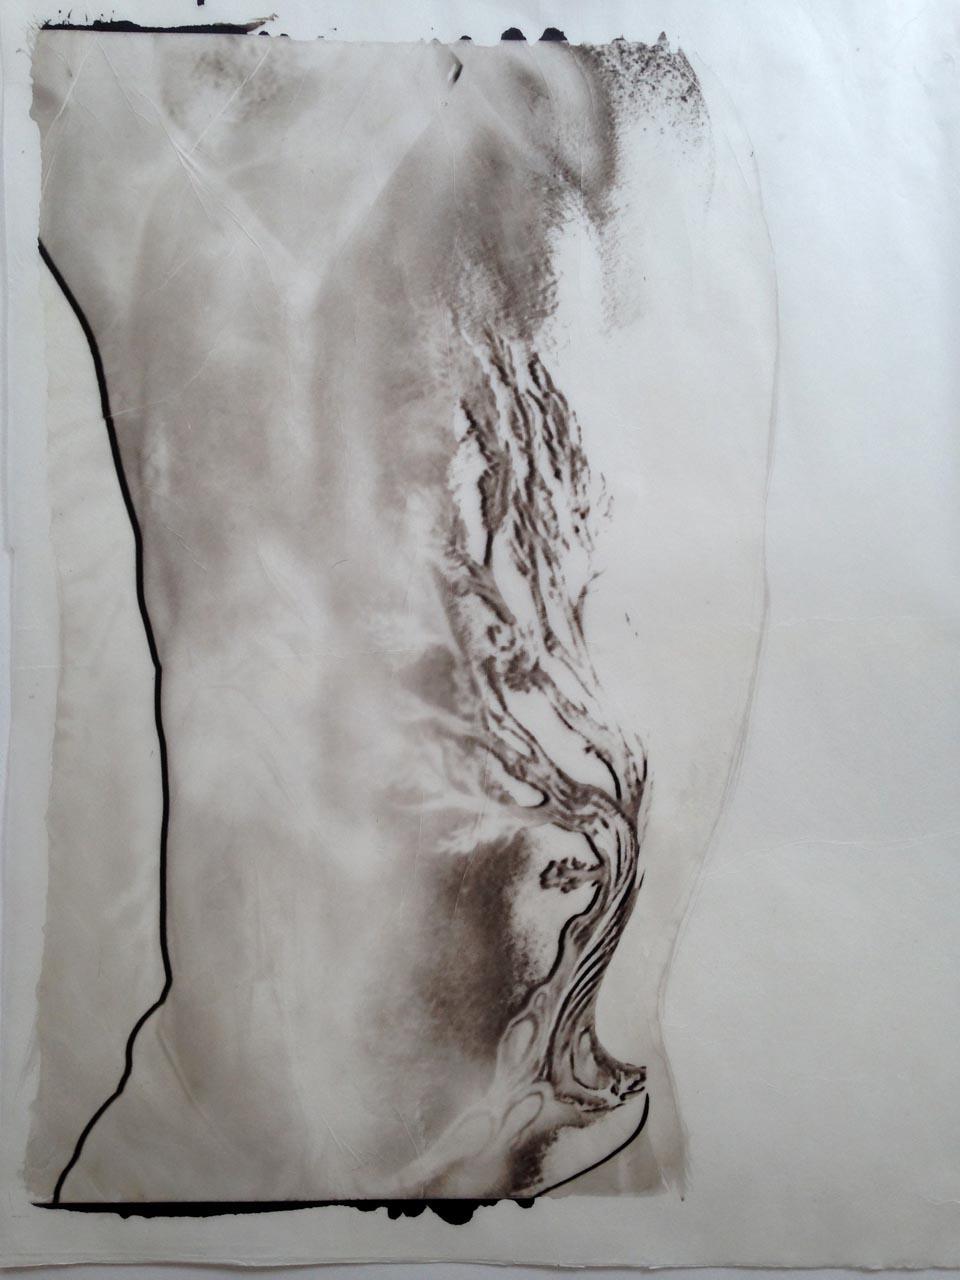 palladium print - abstract image of a man's torso with tree tattoo by Alice Garik